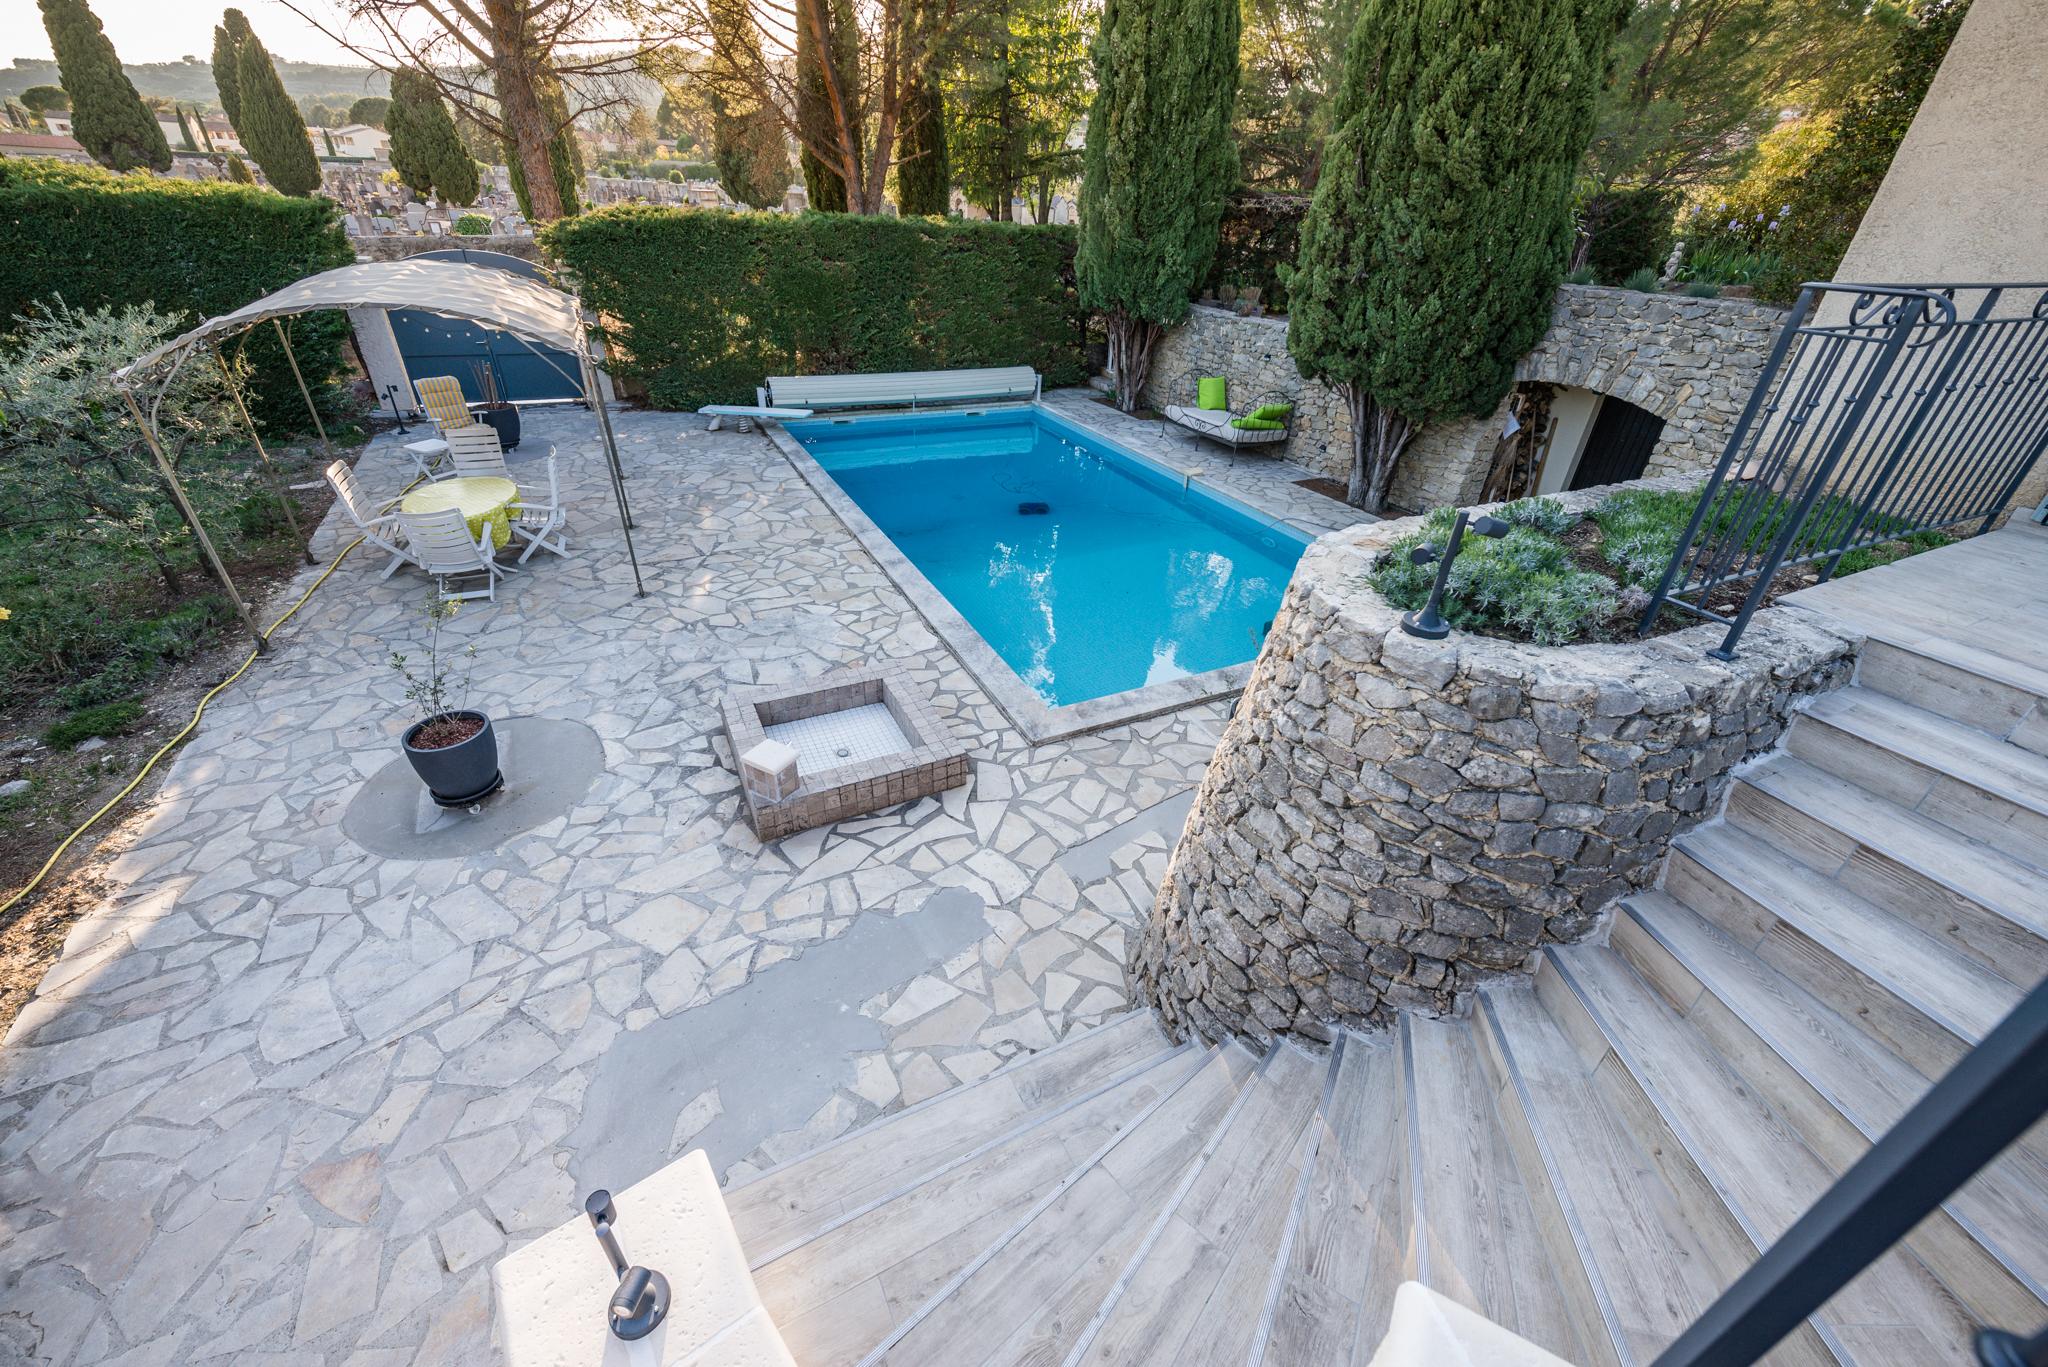 feriebolig-frankrig-sauna-pool-DSC_4706.jpg